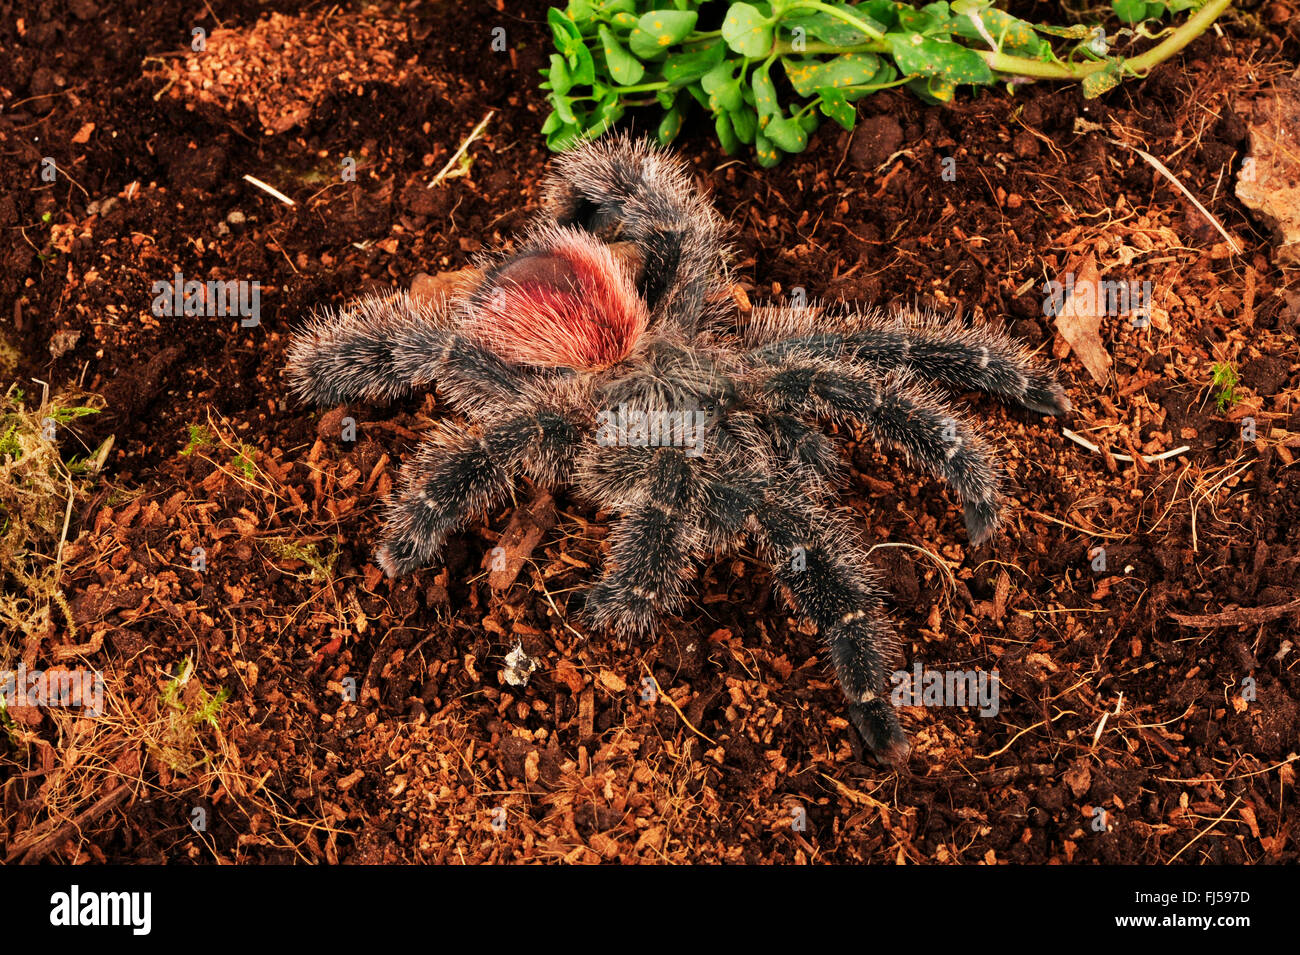 Bird spider (Avicularia spec.), on the ground, Brazil, Amazon region, Manaos - Stock Image